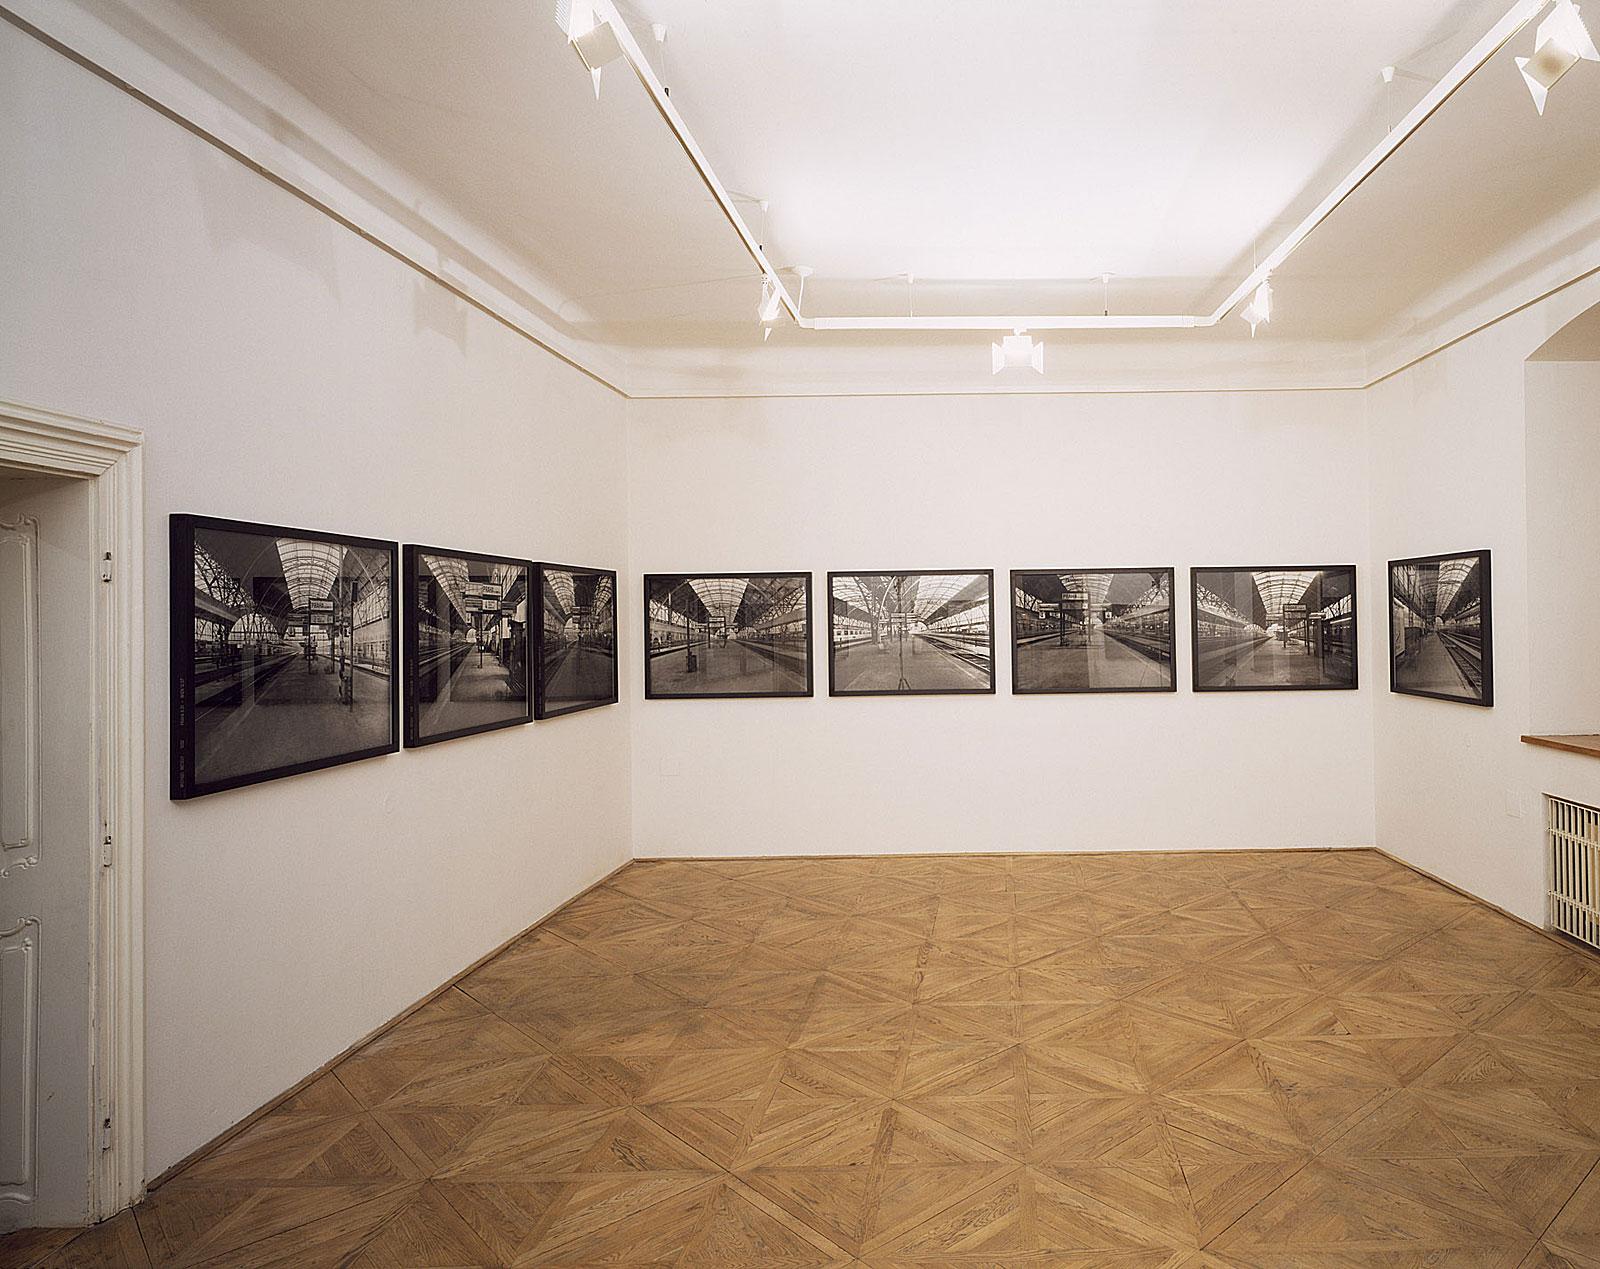 Magia Naturalis - Münchner Künstler in Prag